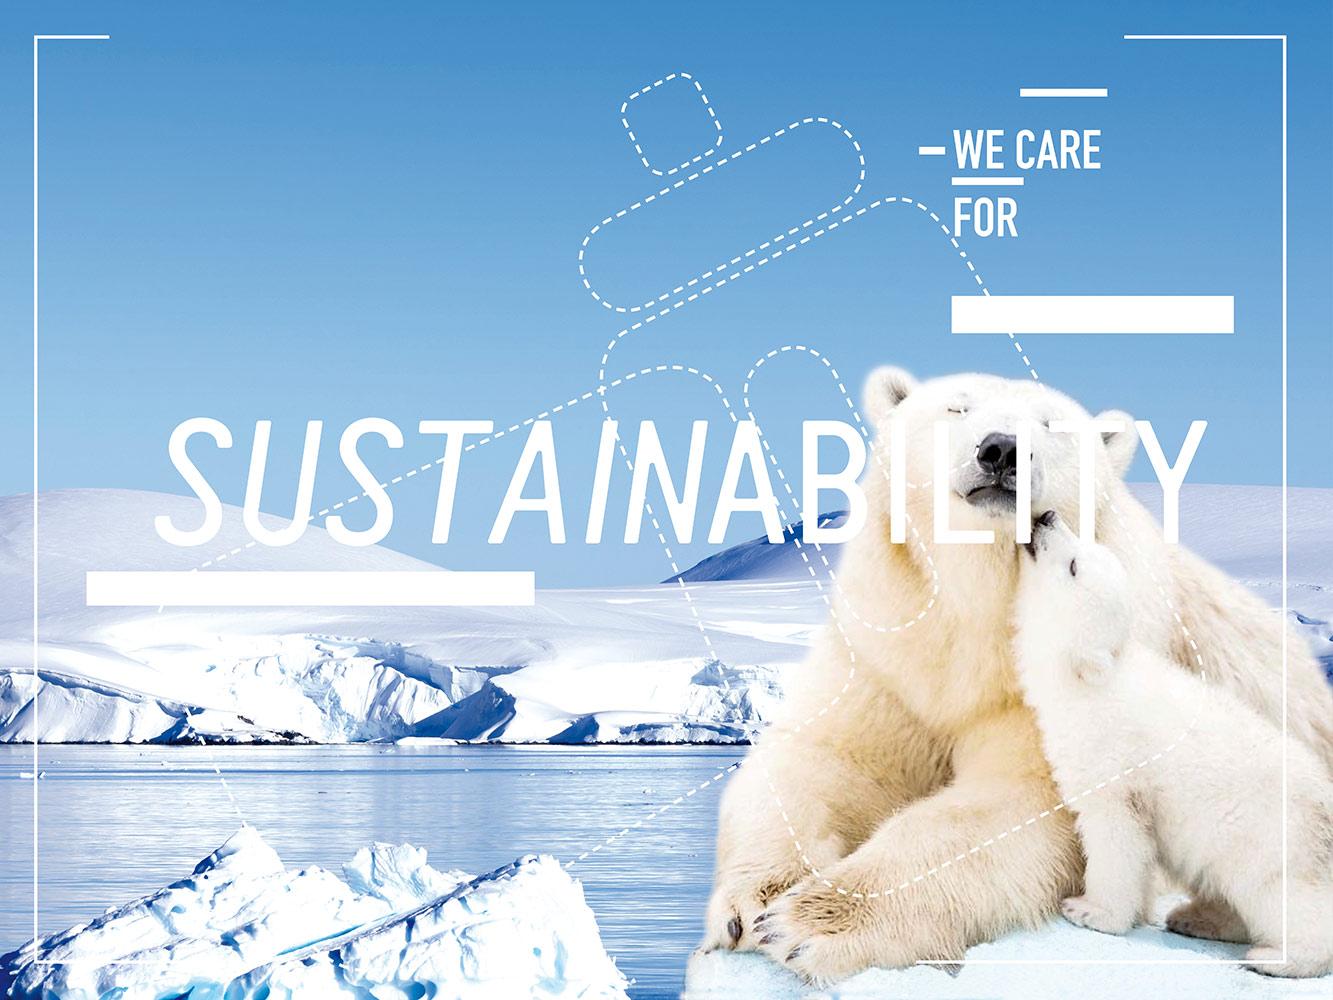 sutainability mother bear cud polar water ice